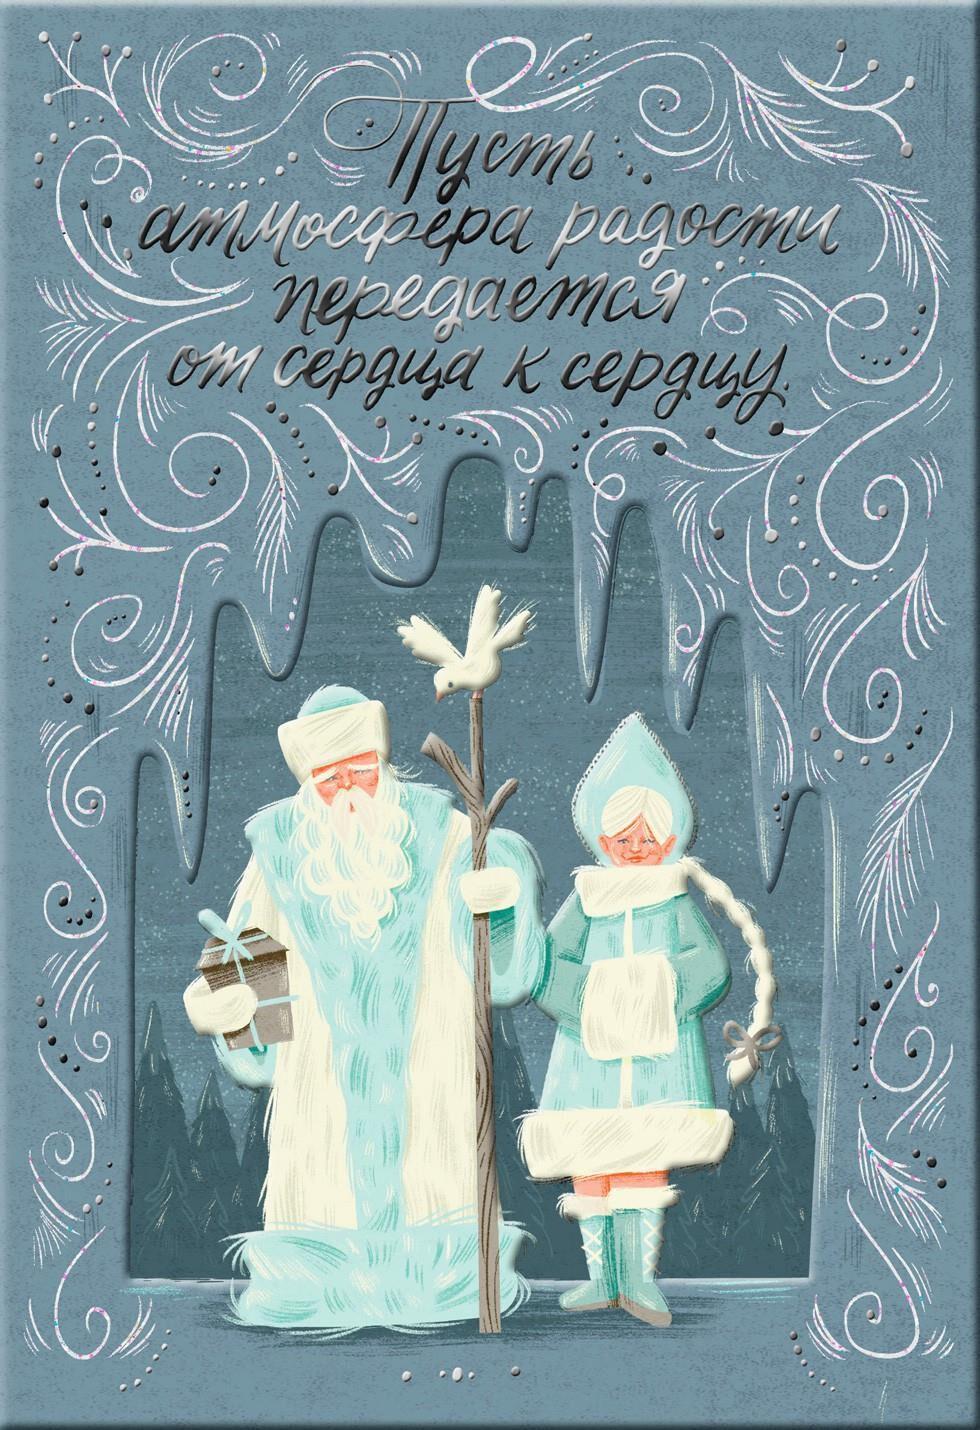 Heritage santa claus russian language christmas card greeting heritage santa claus russian language christmas card greeting cards hallmark kristyandbryce Gallery